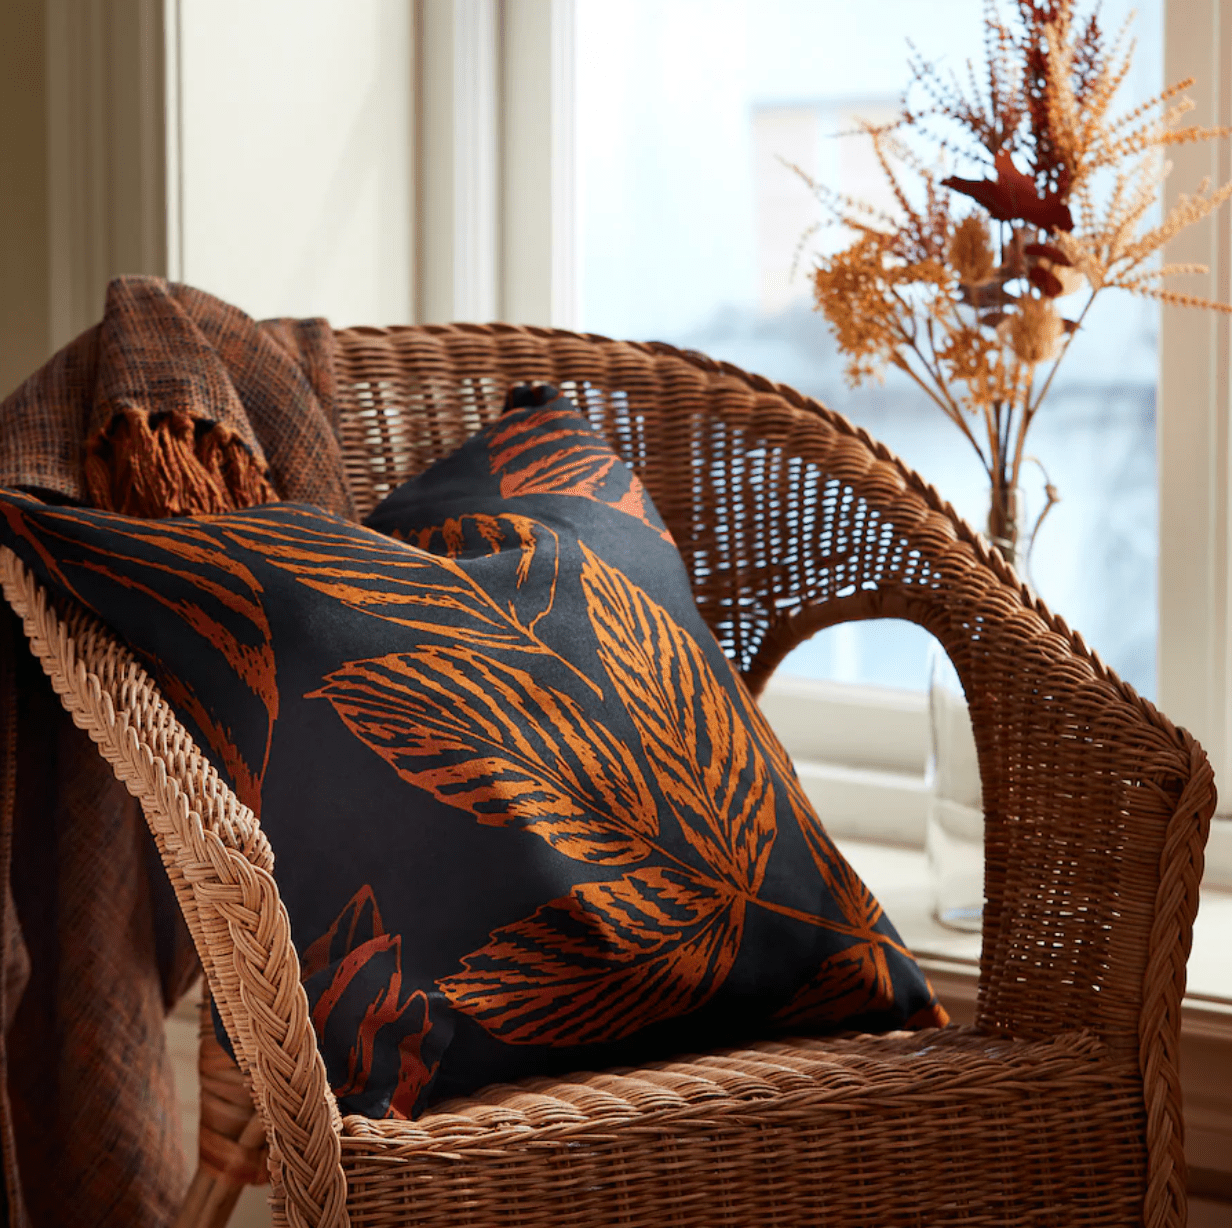 A leaf-patterned throw cushion